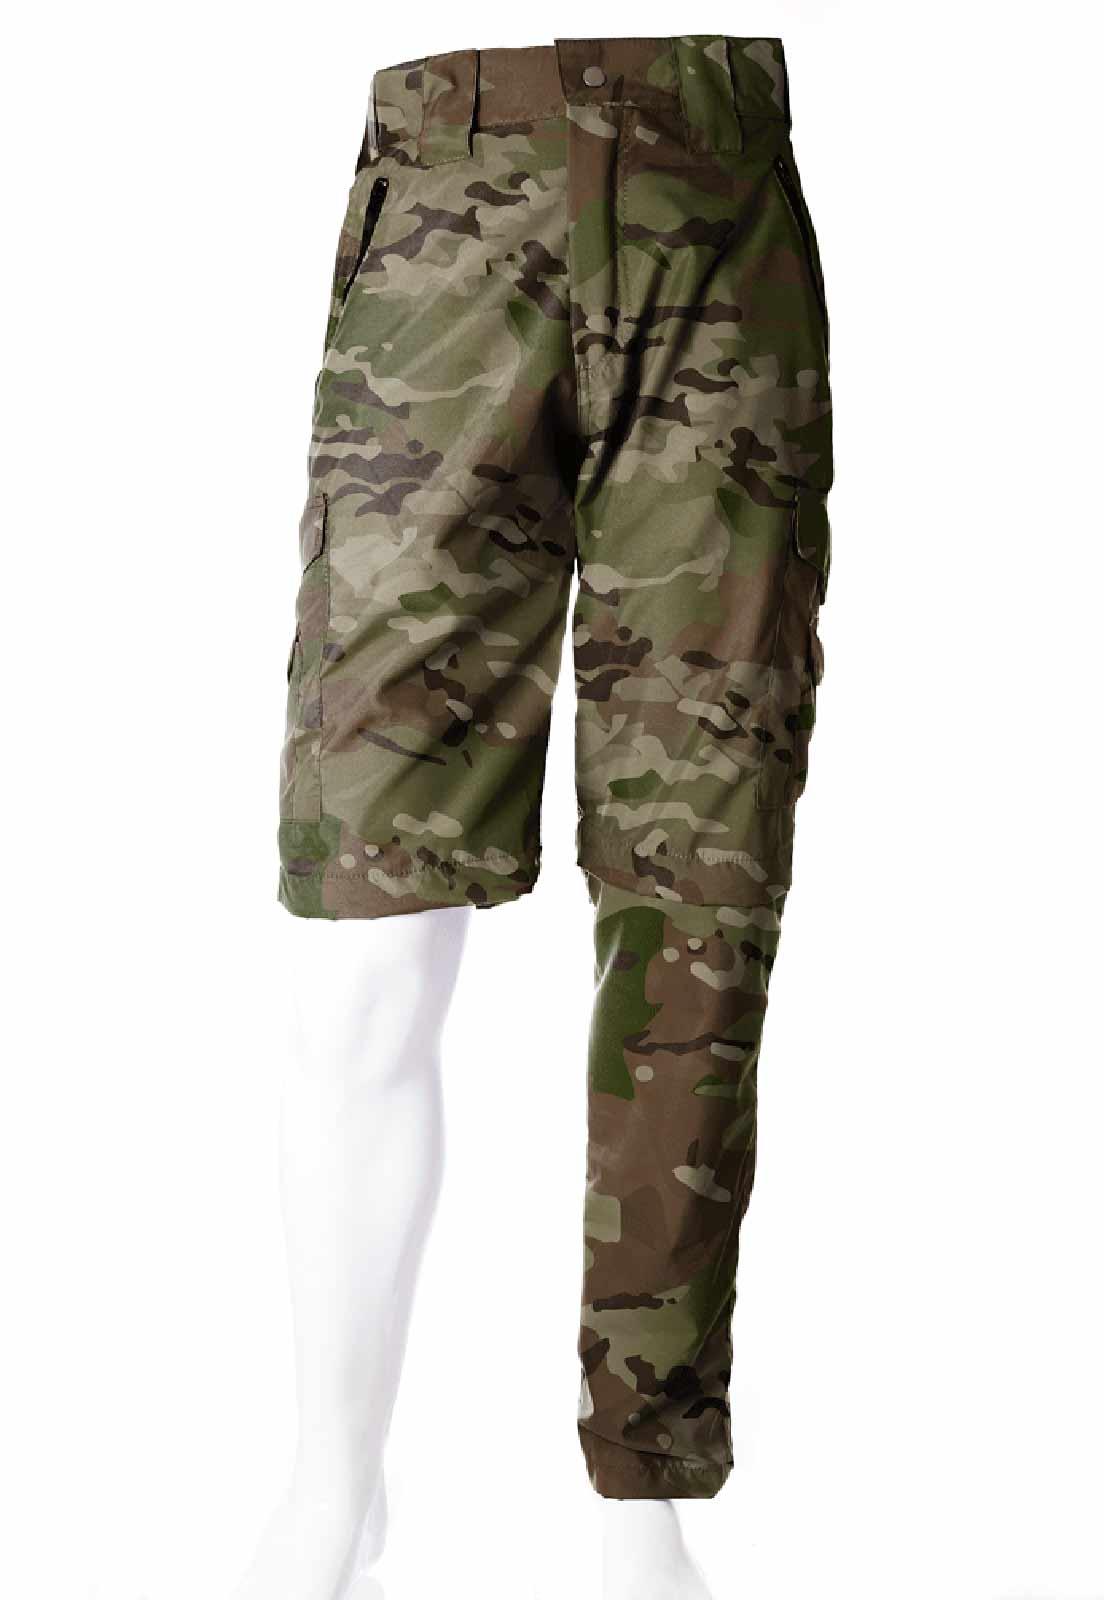 Calça-Bermuda Camuflada Exército Multicam UltraLight Masculina  - REAL HUNTER OUTDOORS